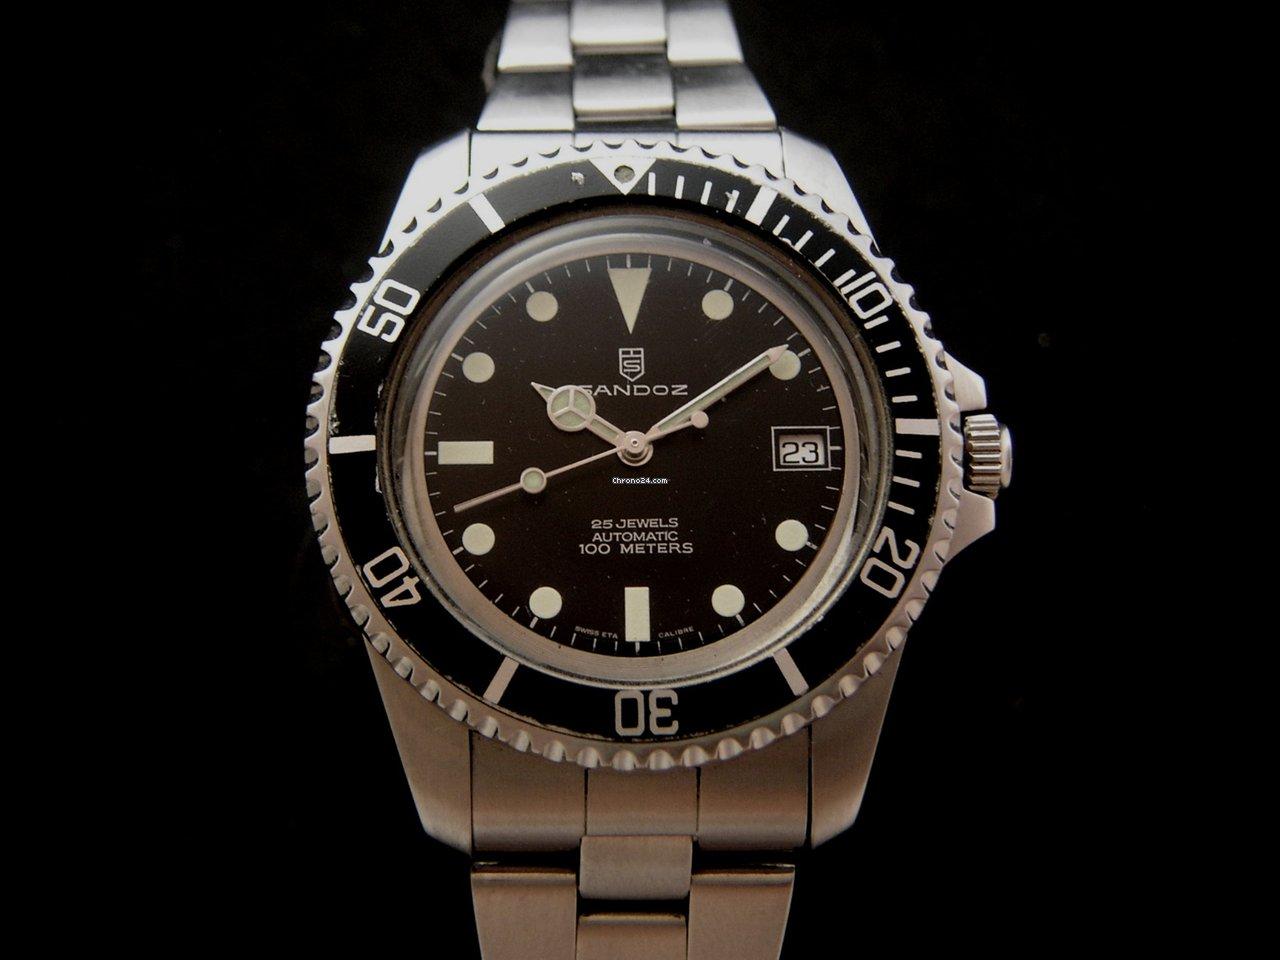 sandoz vintage 60 39 s automatic 100m diver watch verkauft auf chrono24. Black Bedroom Furniture Sets. Home Design Ideas